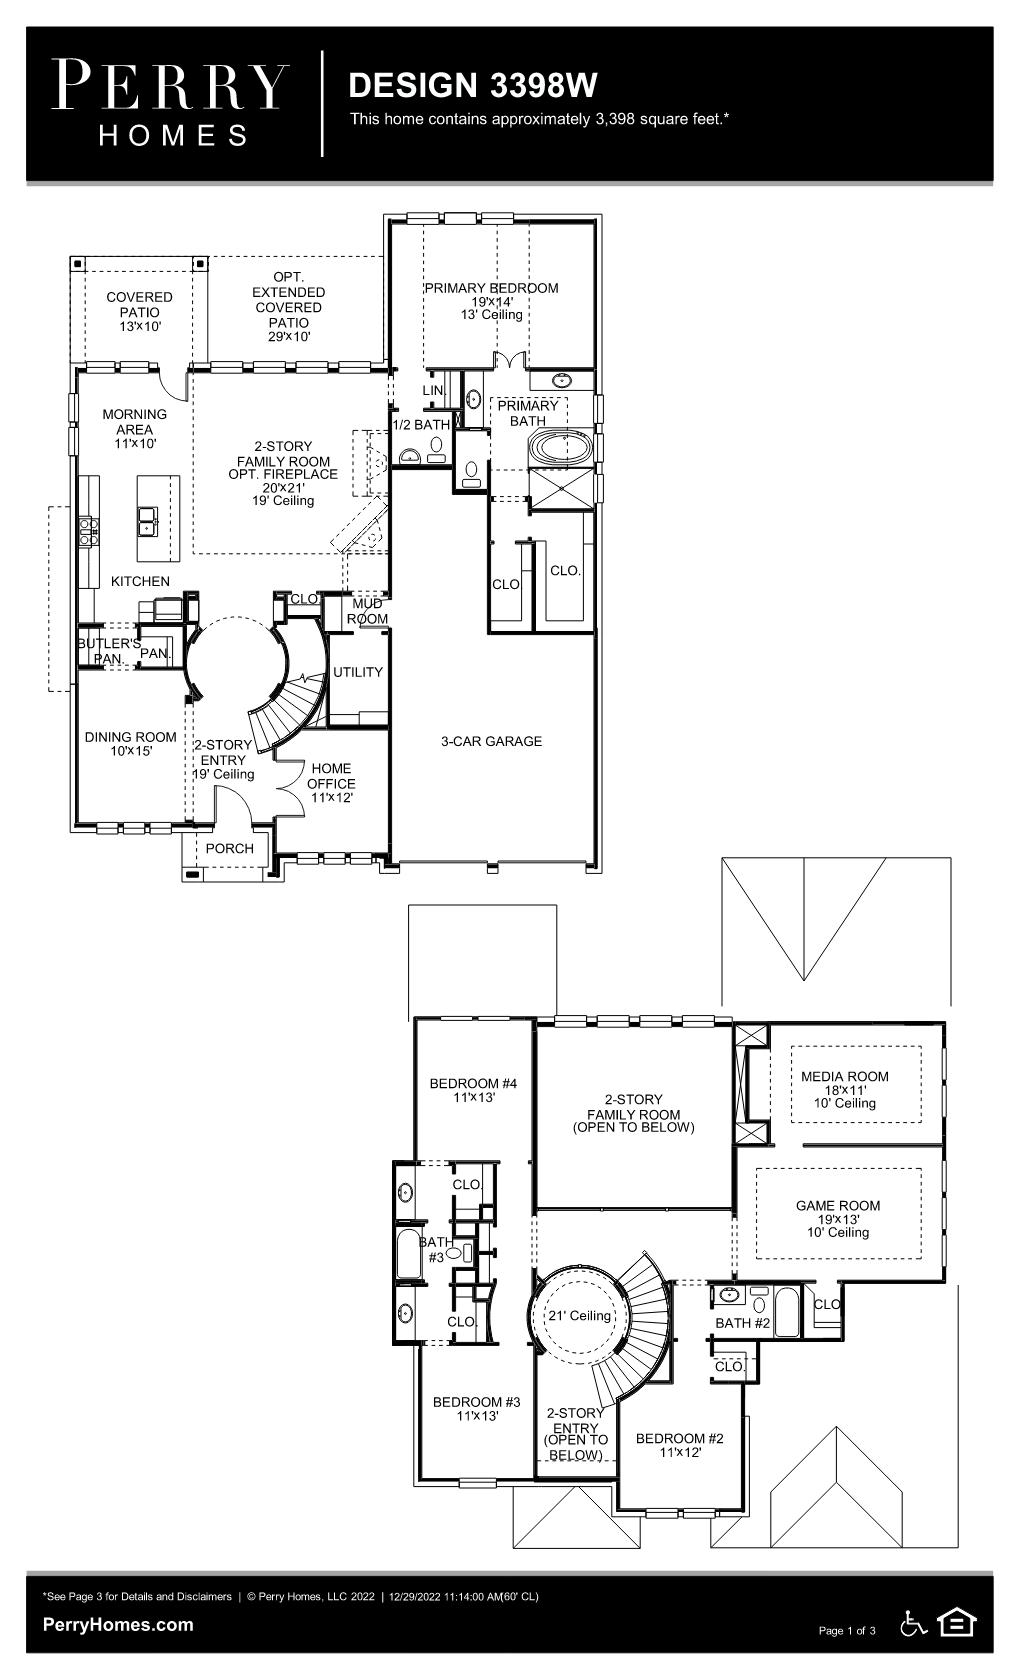 Floor Plan for 3398W